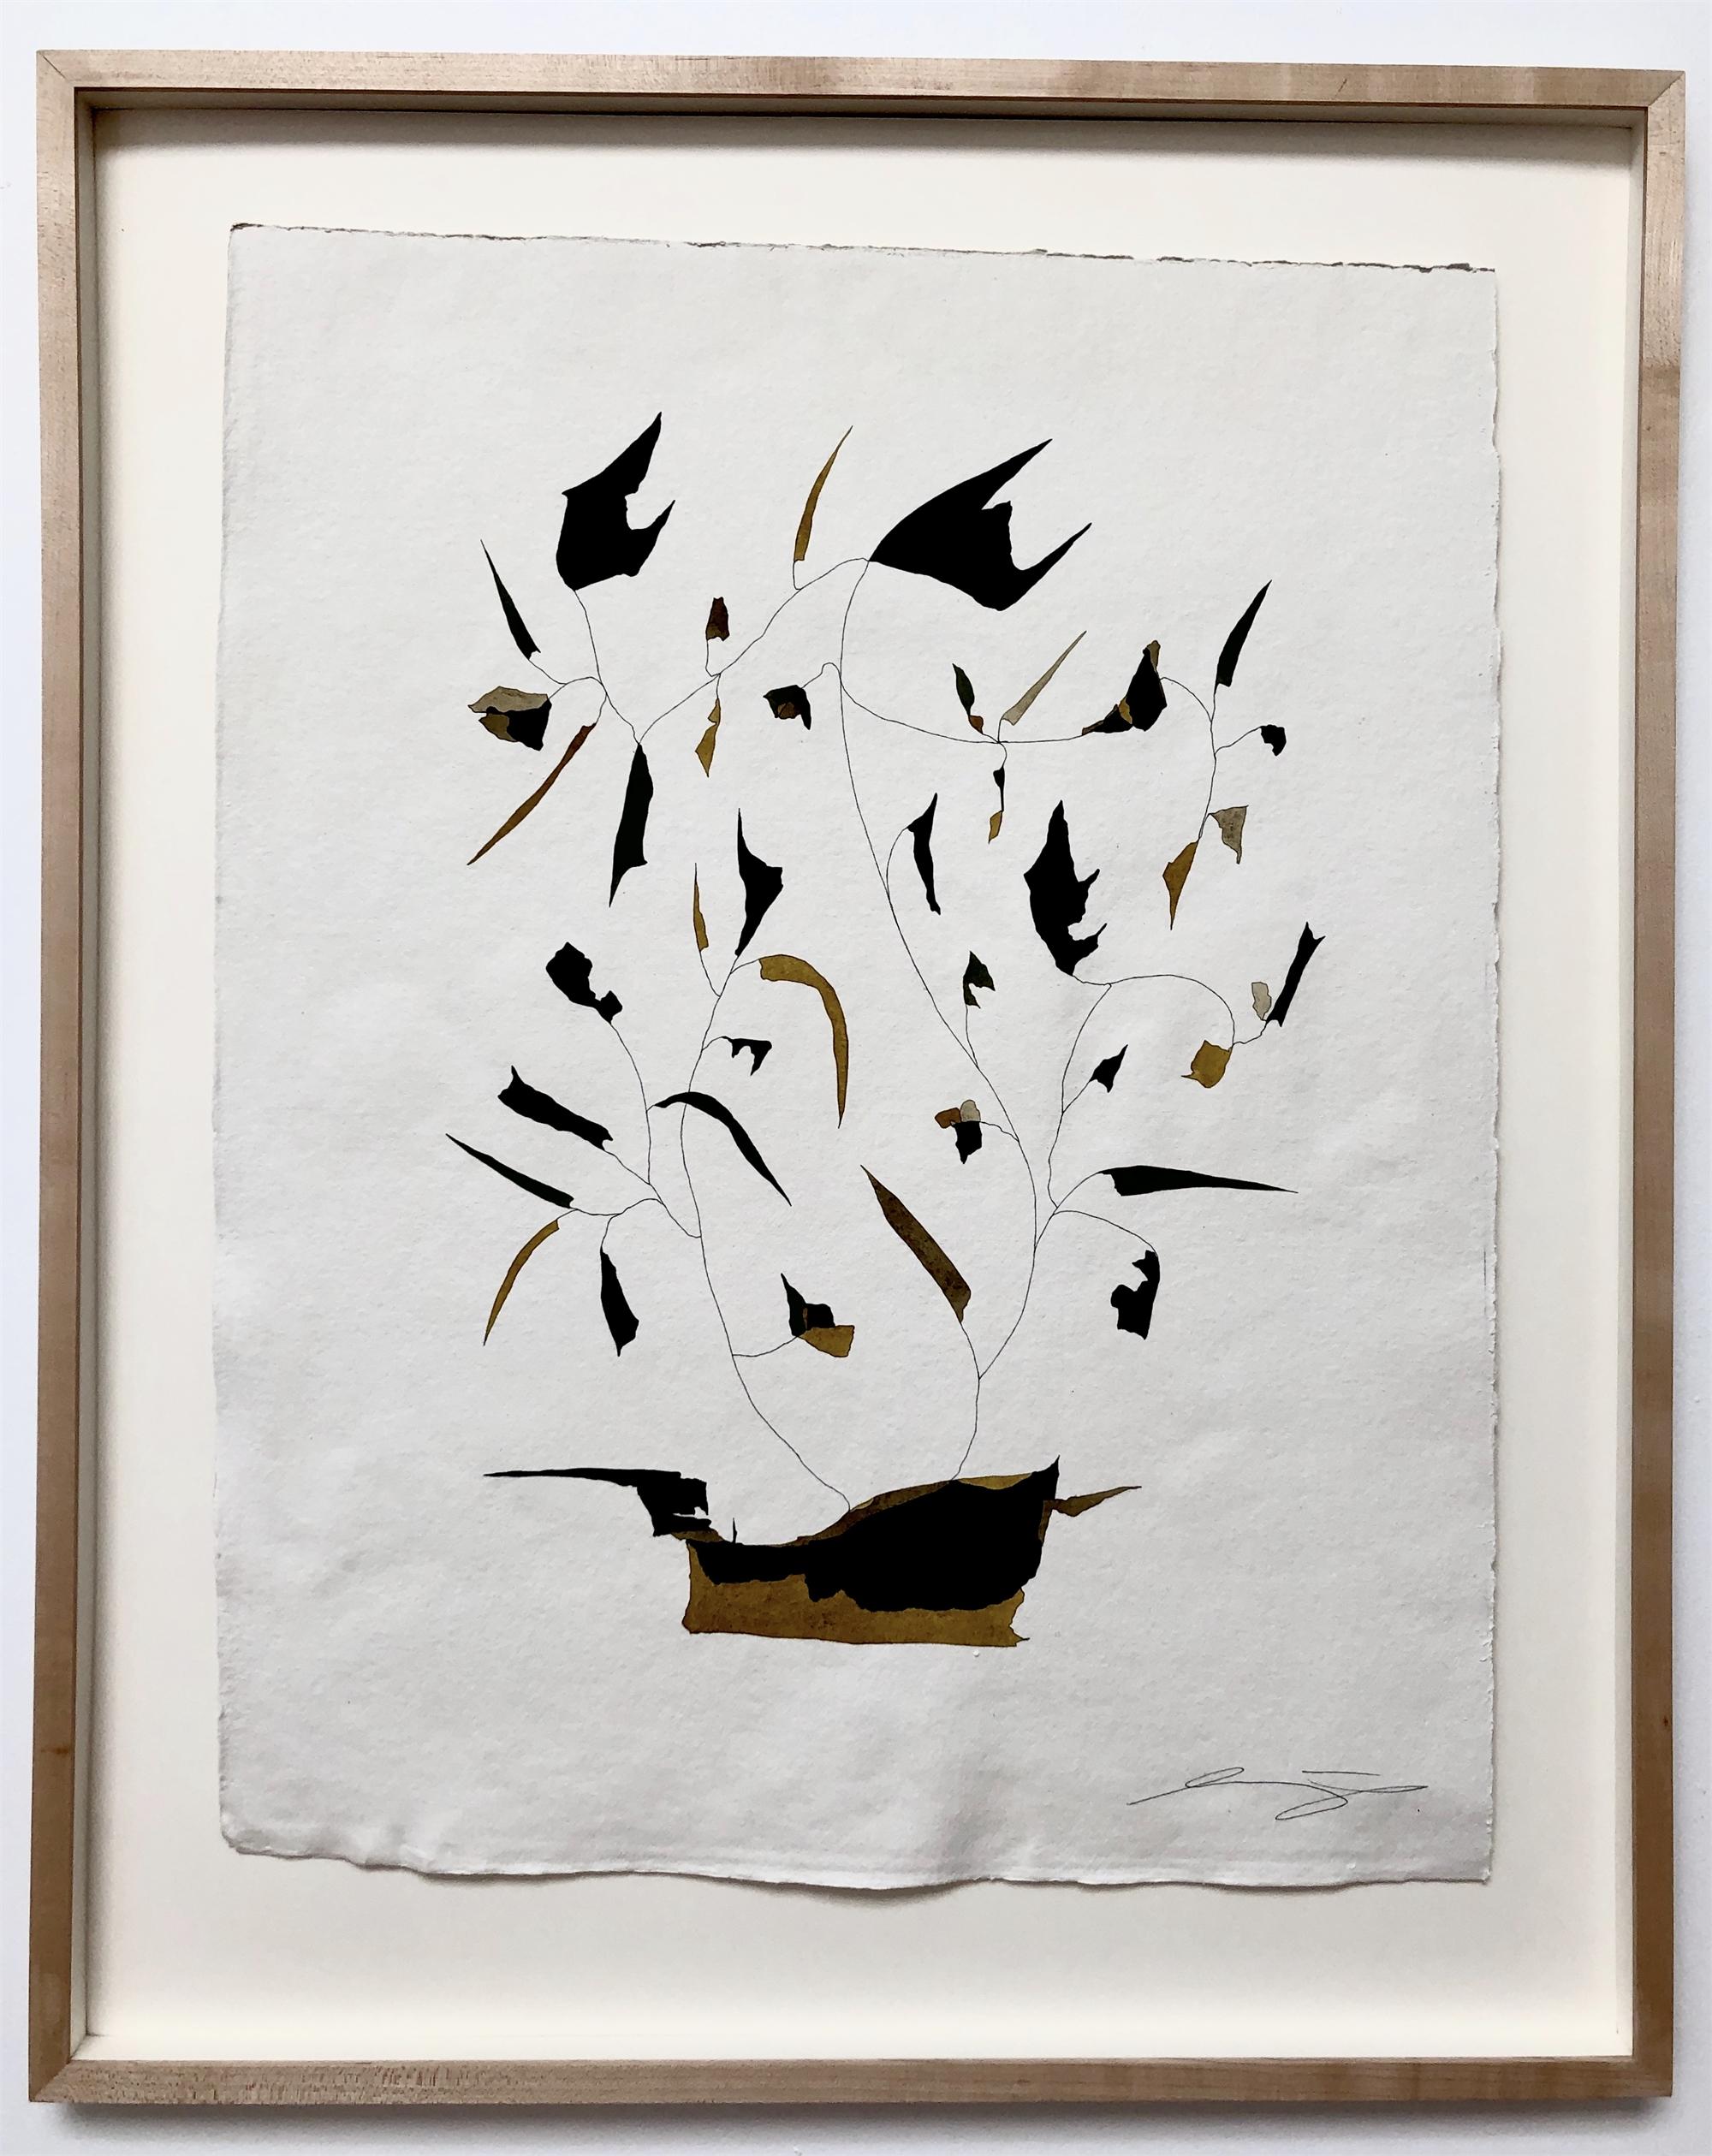 Untitled I by Lindsey Porter